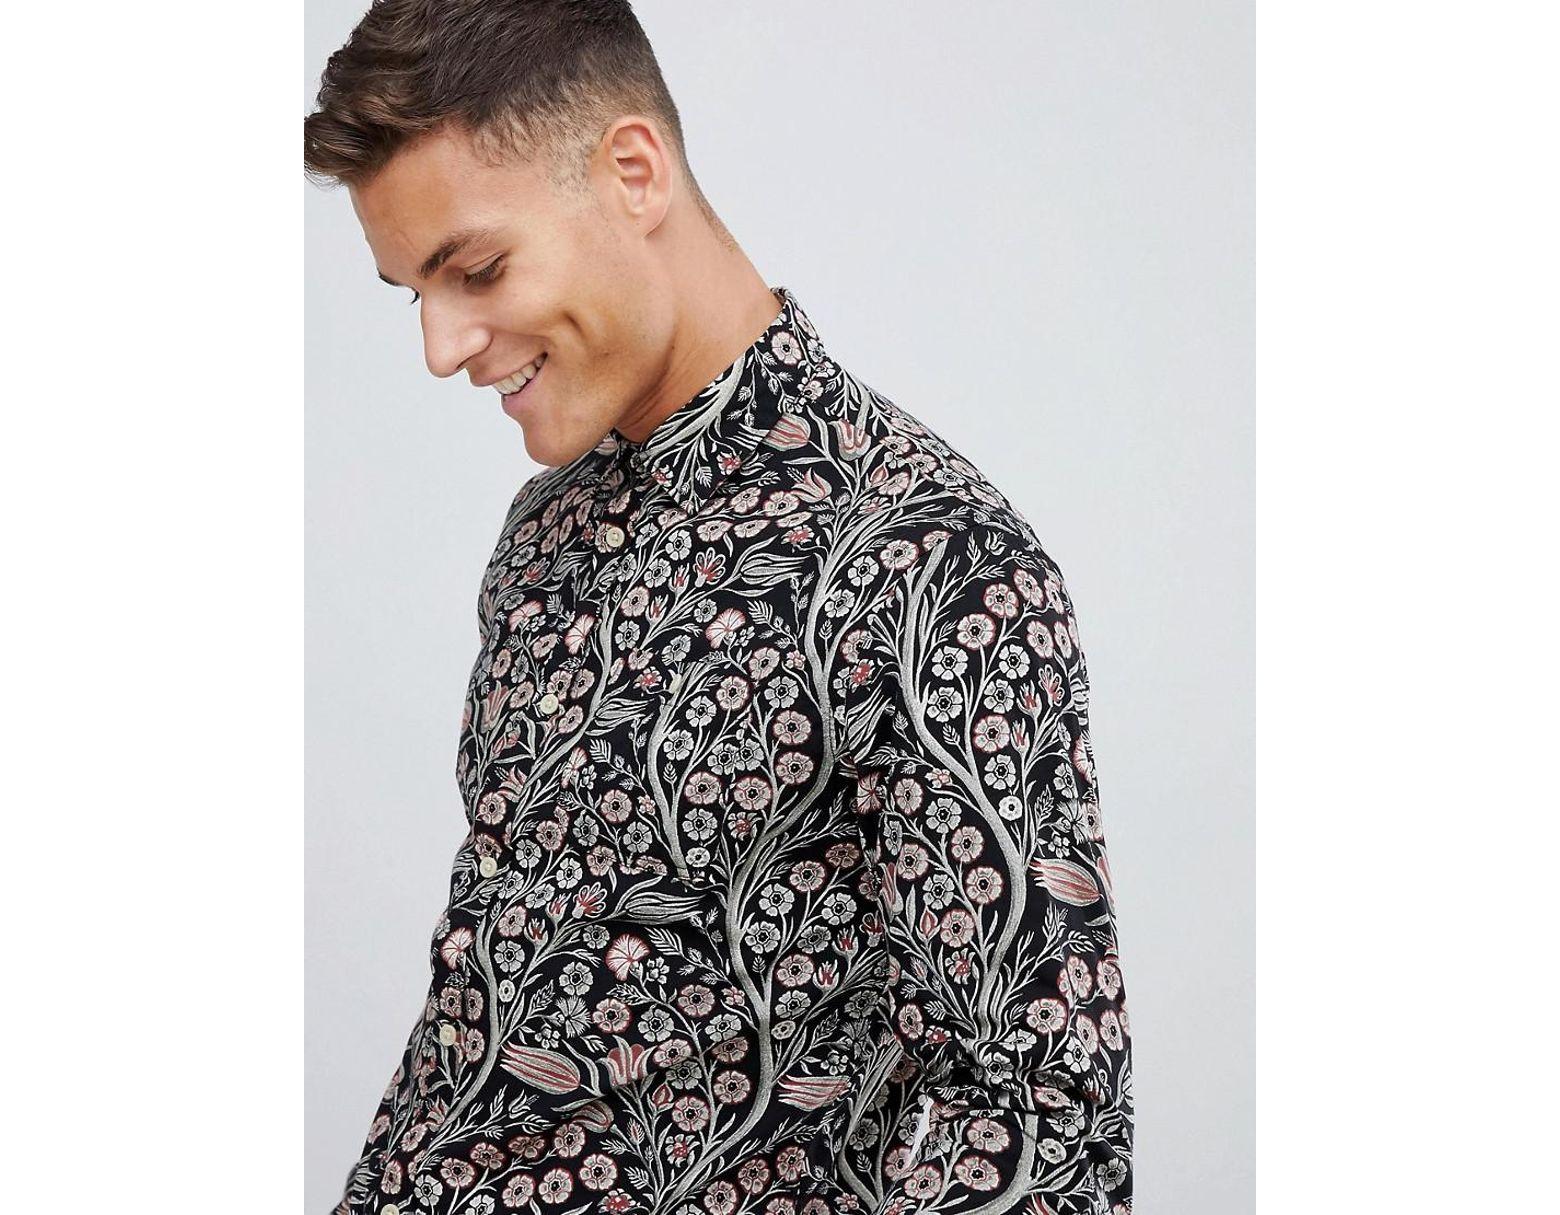 62d34c2ad Jack & Jones Premium Smart Shirt In Slim Fit Floral Print in Black for Men  - Lyst